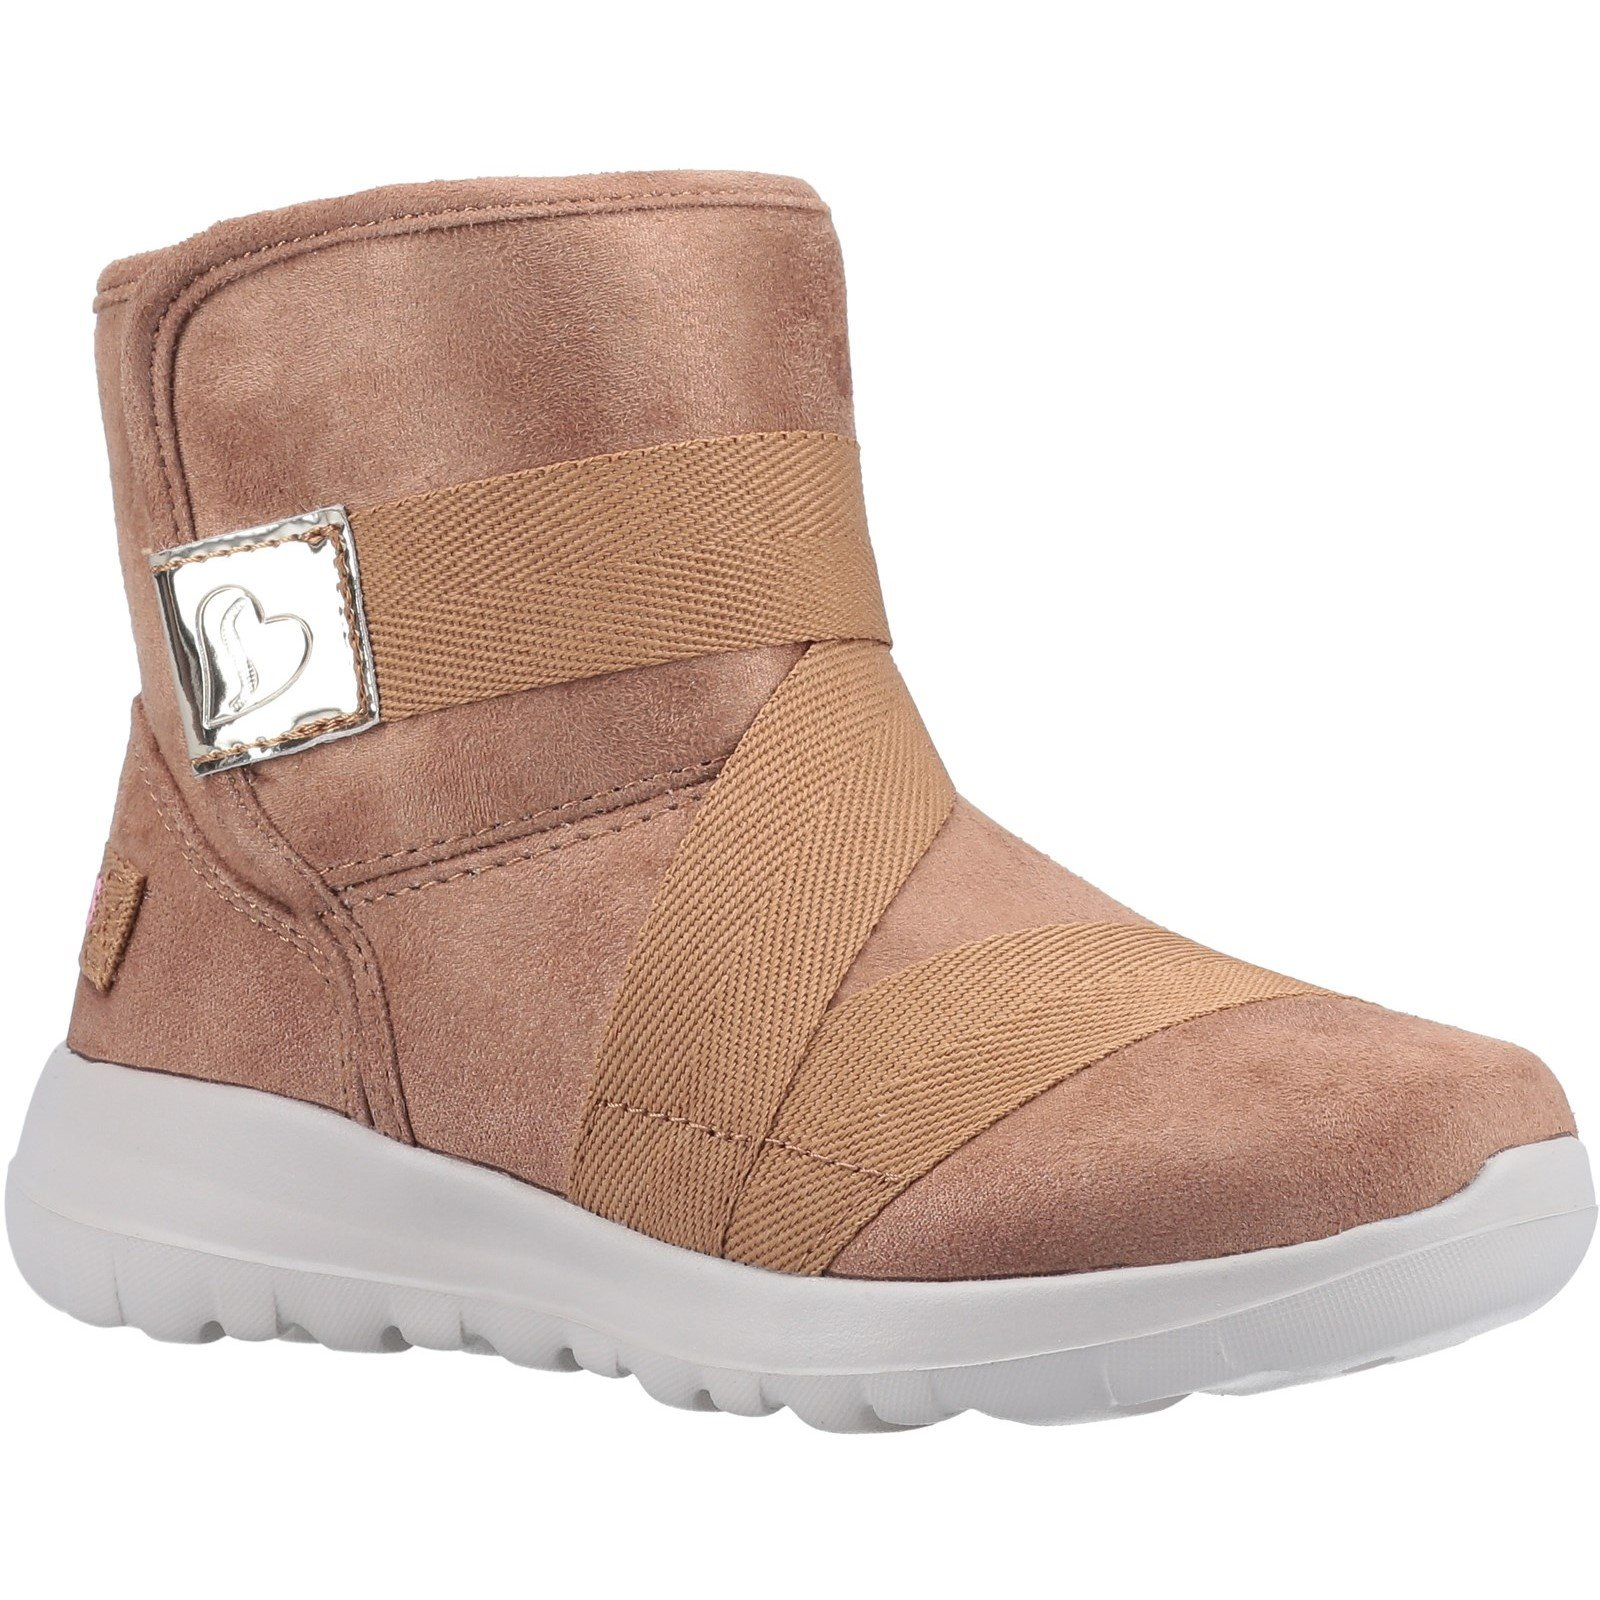 Skechers Unisex Go Walk Joy Strong Willed Ankle Boot Chestnut 31167 - Chestnut 9.5